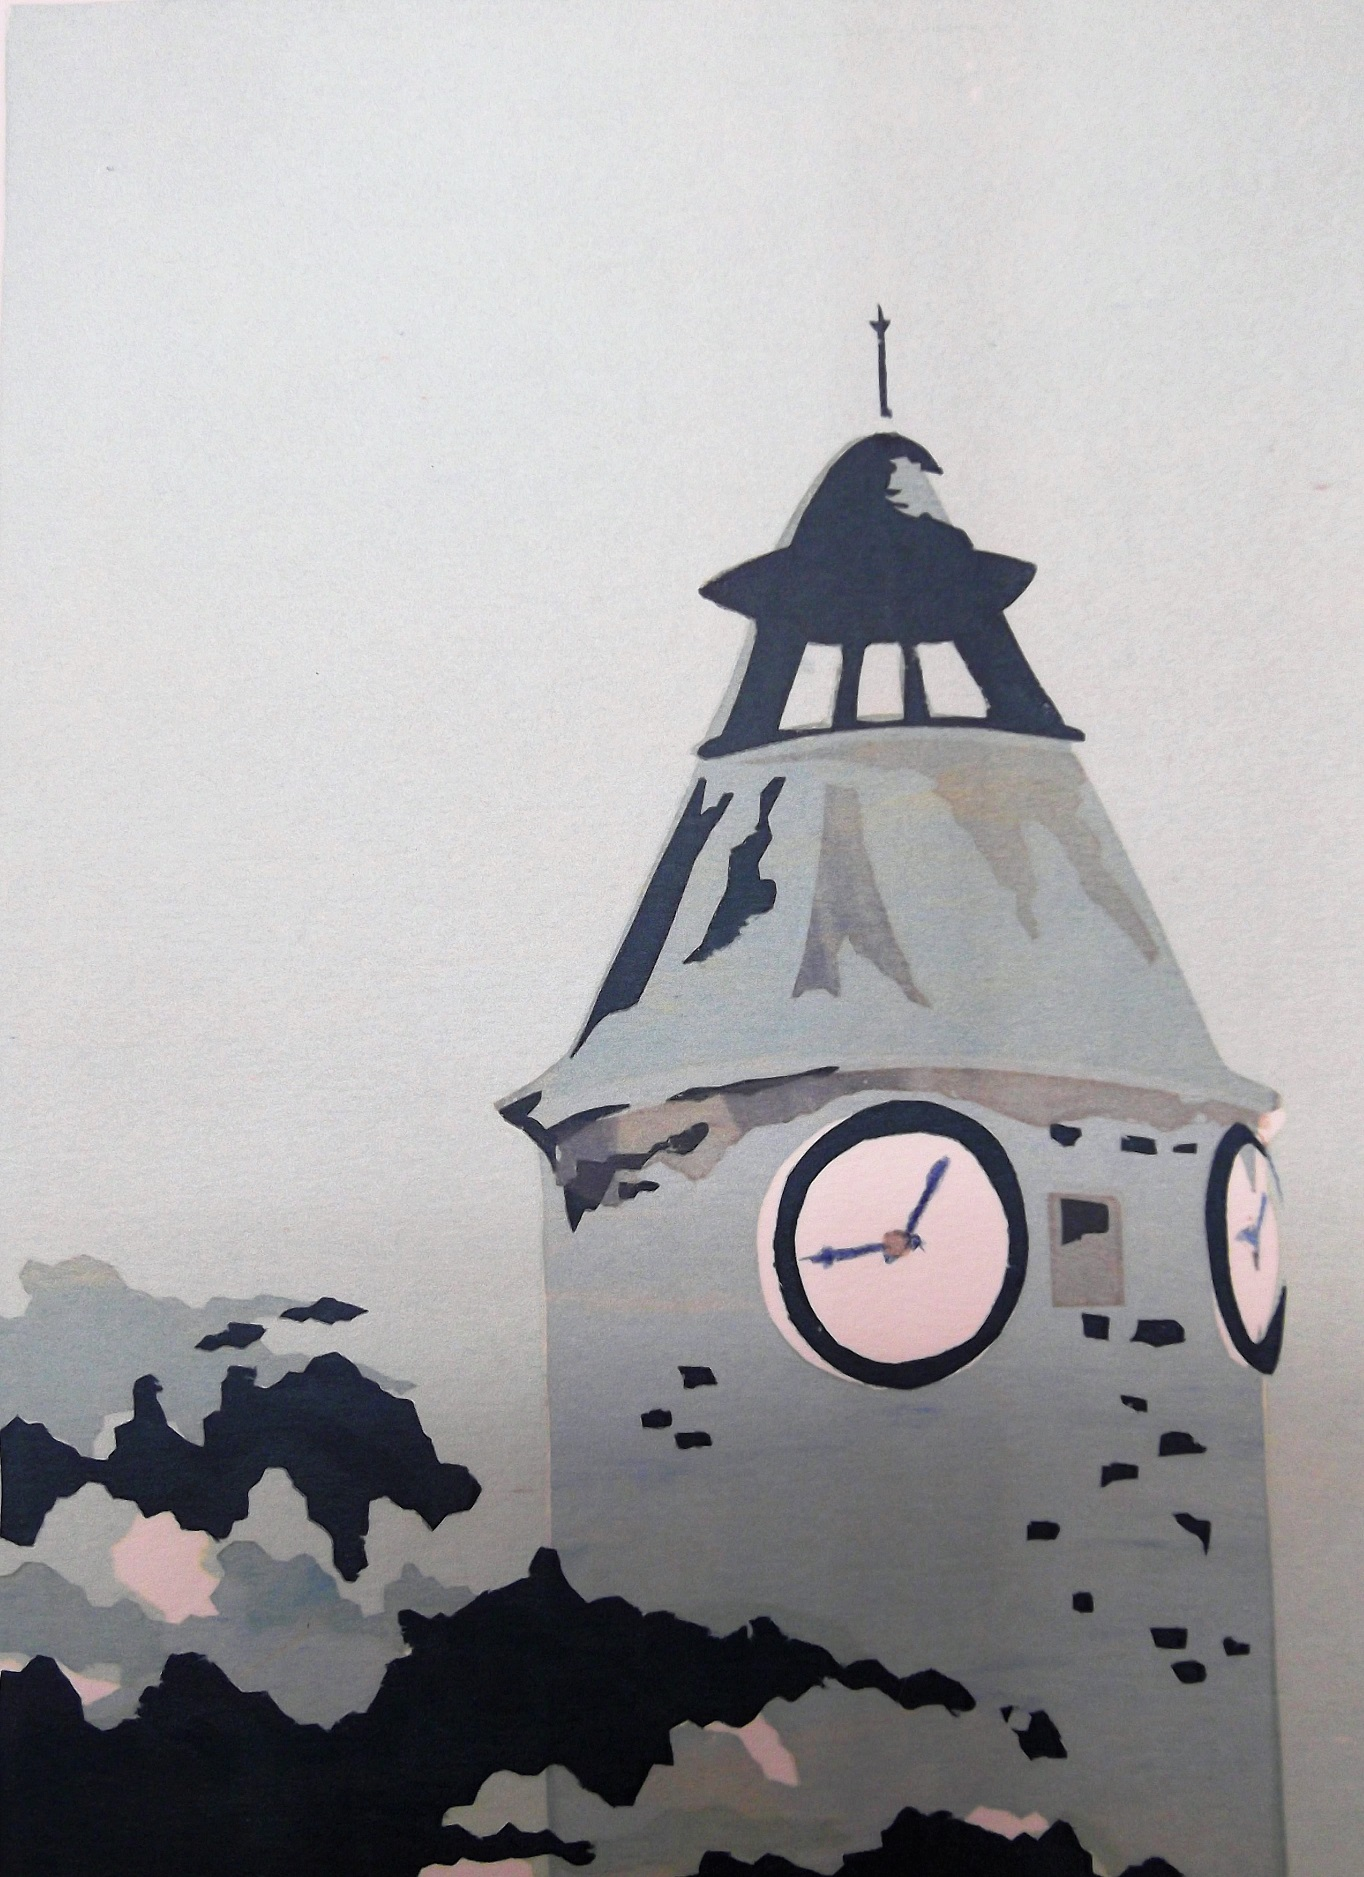 Aubusson Clocktower, Winter